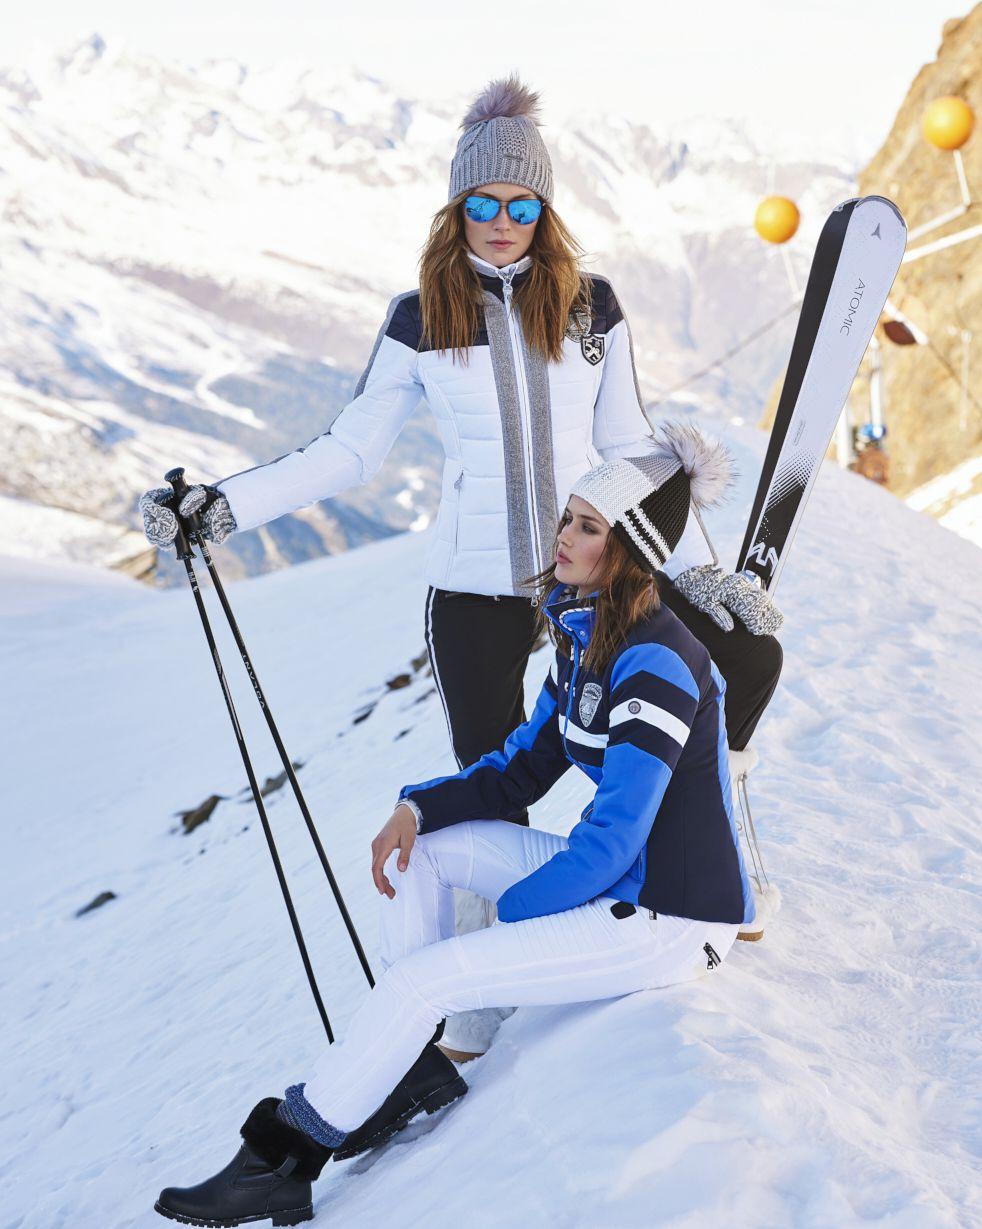 Sportalm Women Ski Wear Skiing Outfit Snowboarding Outfit Ski Fashion Womens